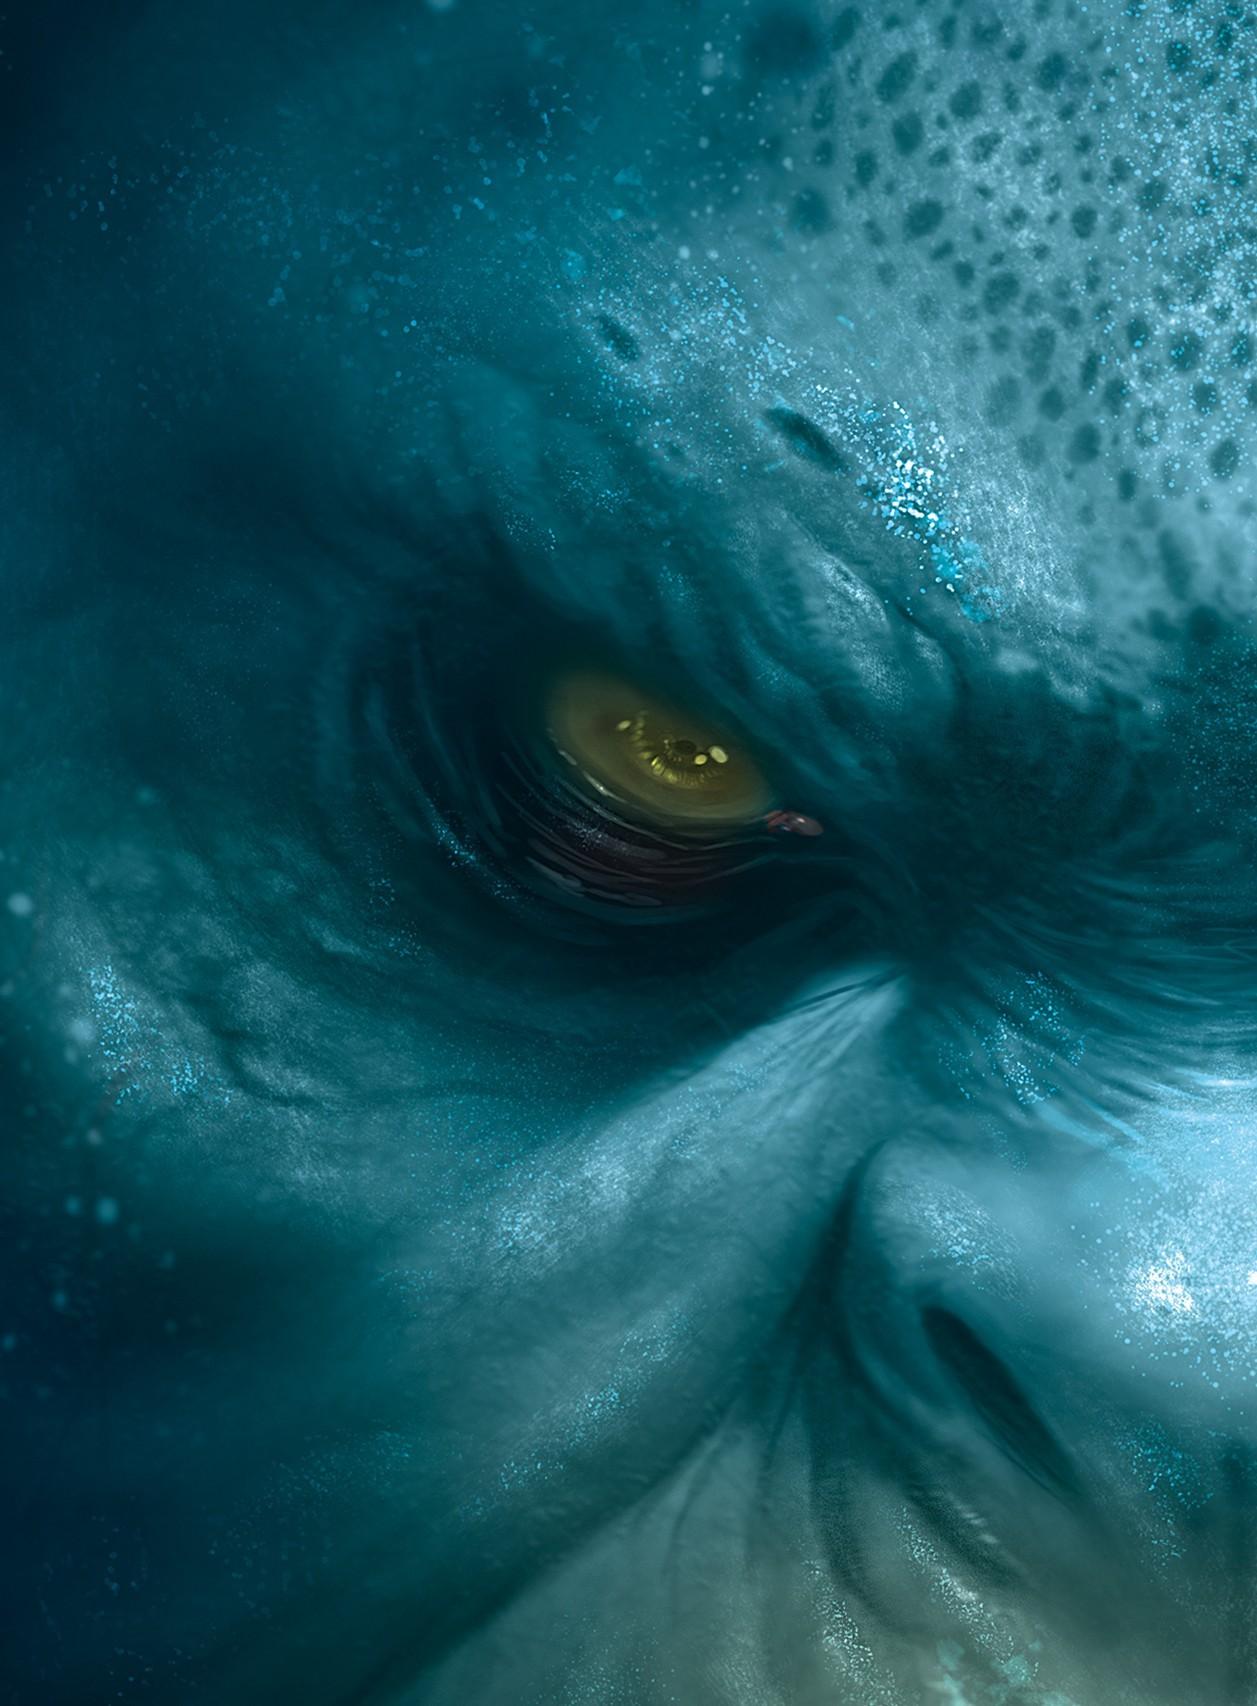 Abyss, Abyss, Abyss, Abyss et Abyss sont dans un bateau